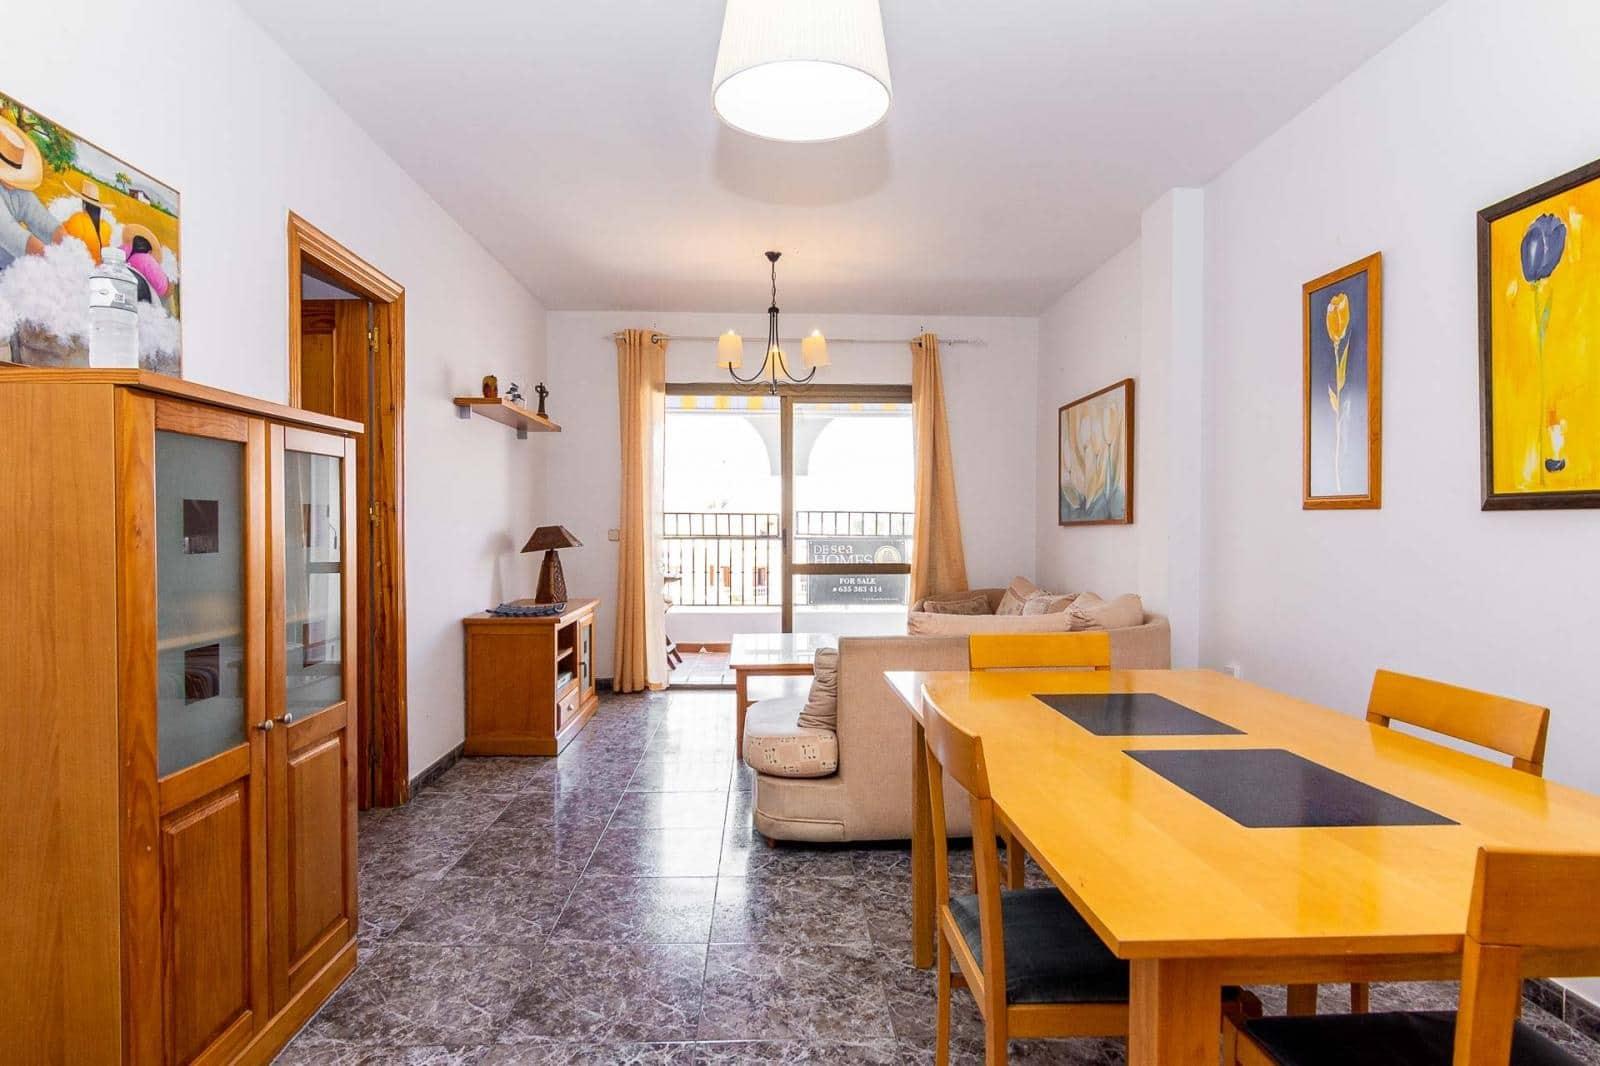 3 bedroom Apartment for sale in Nerja - € 184,500 (Ref: 5072498)